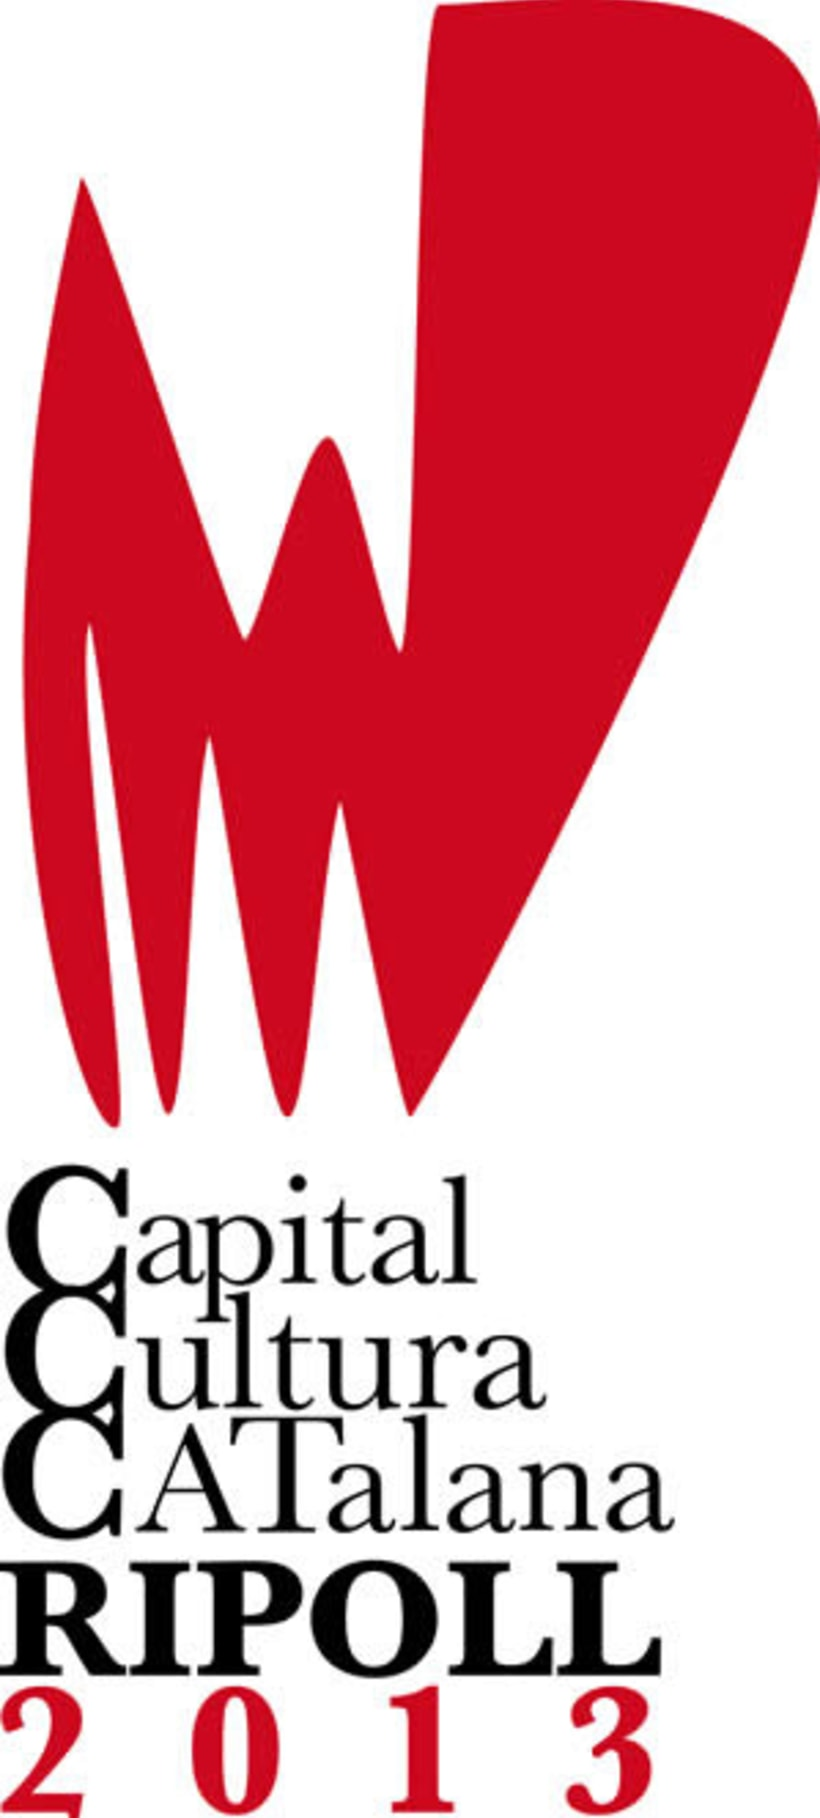 Ripoll Capital Cultura Catalana 2013 1